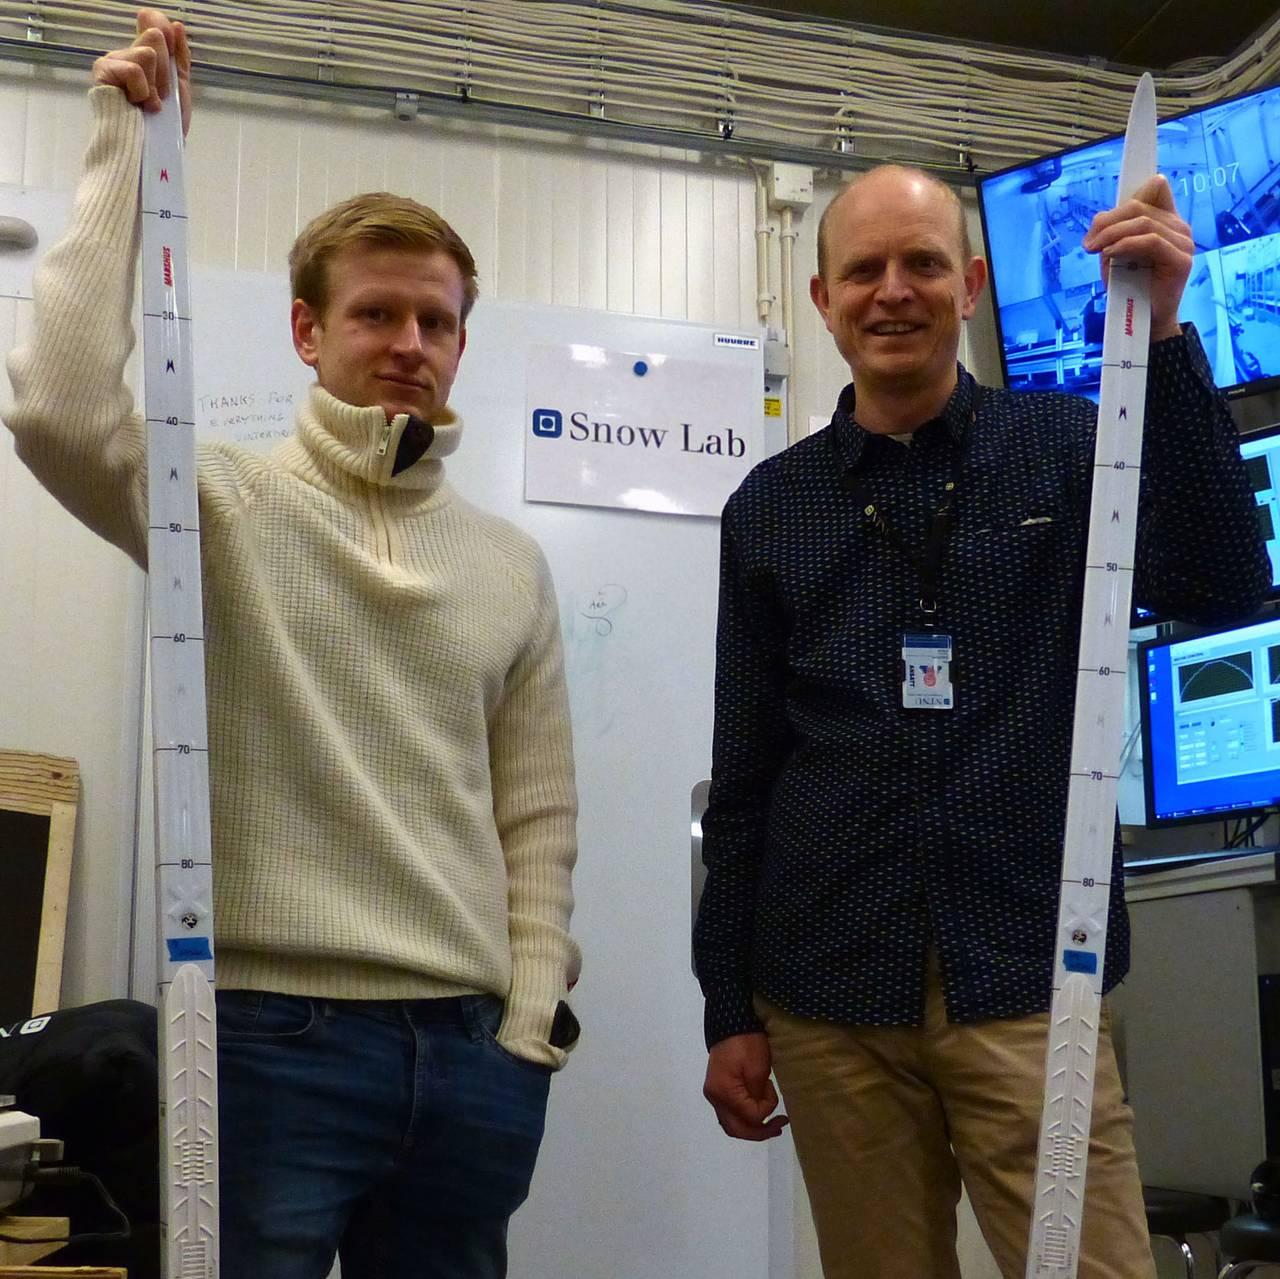 Alex Klein-Paste og Sondre Bergtun Auganæs, NTNU